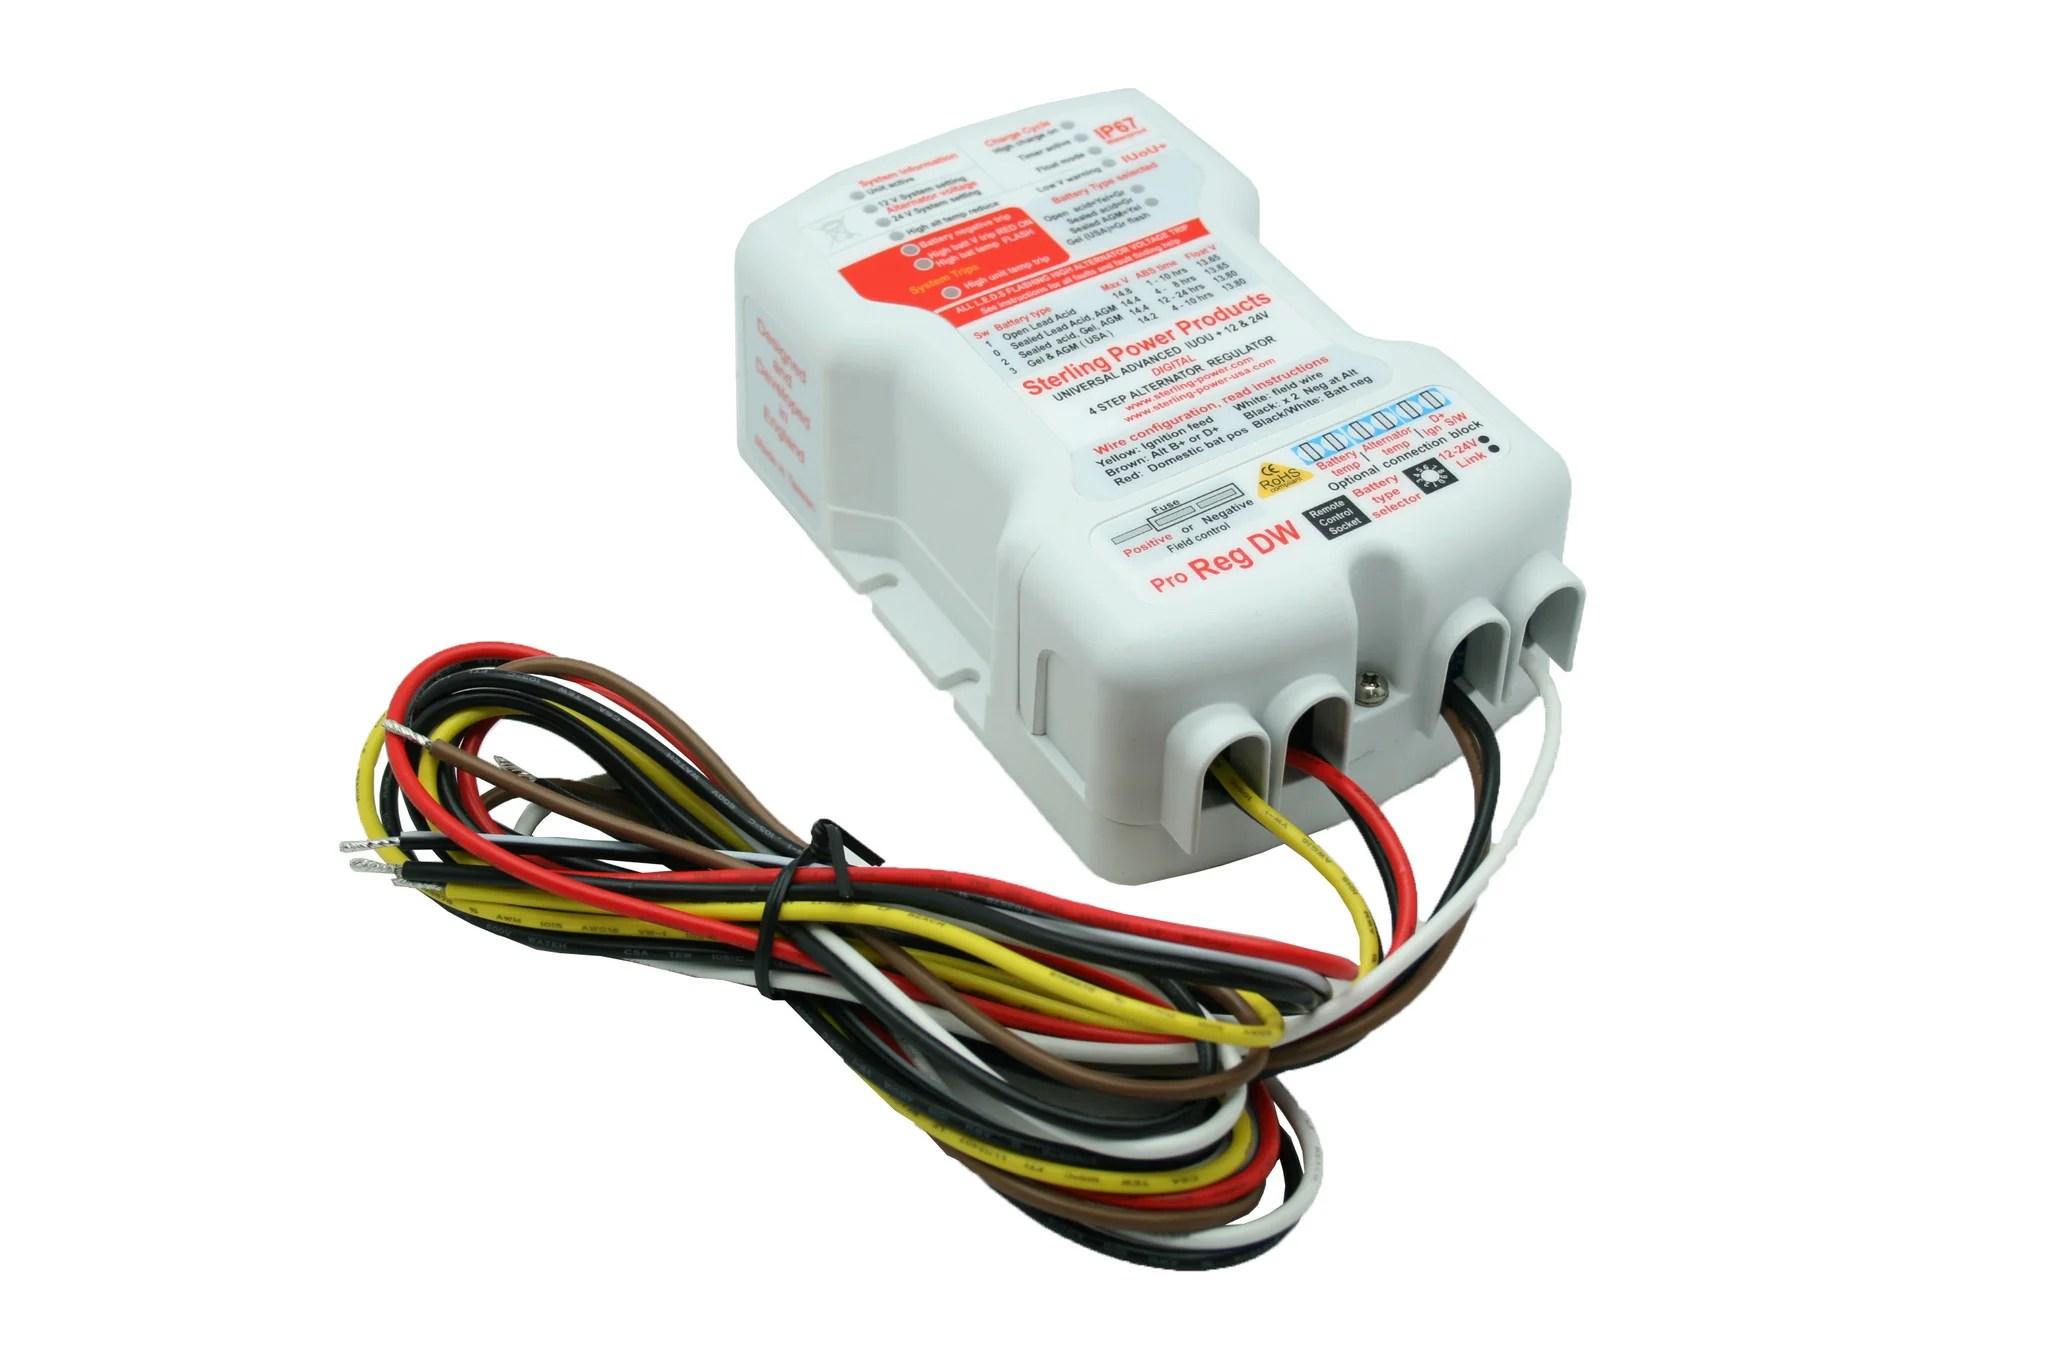 universal advanced digital alternator regulator pro reg dw waterproof pdarw 220 80 products [ 2048 x 1367 Pixel ]